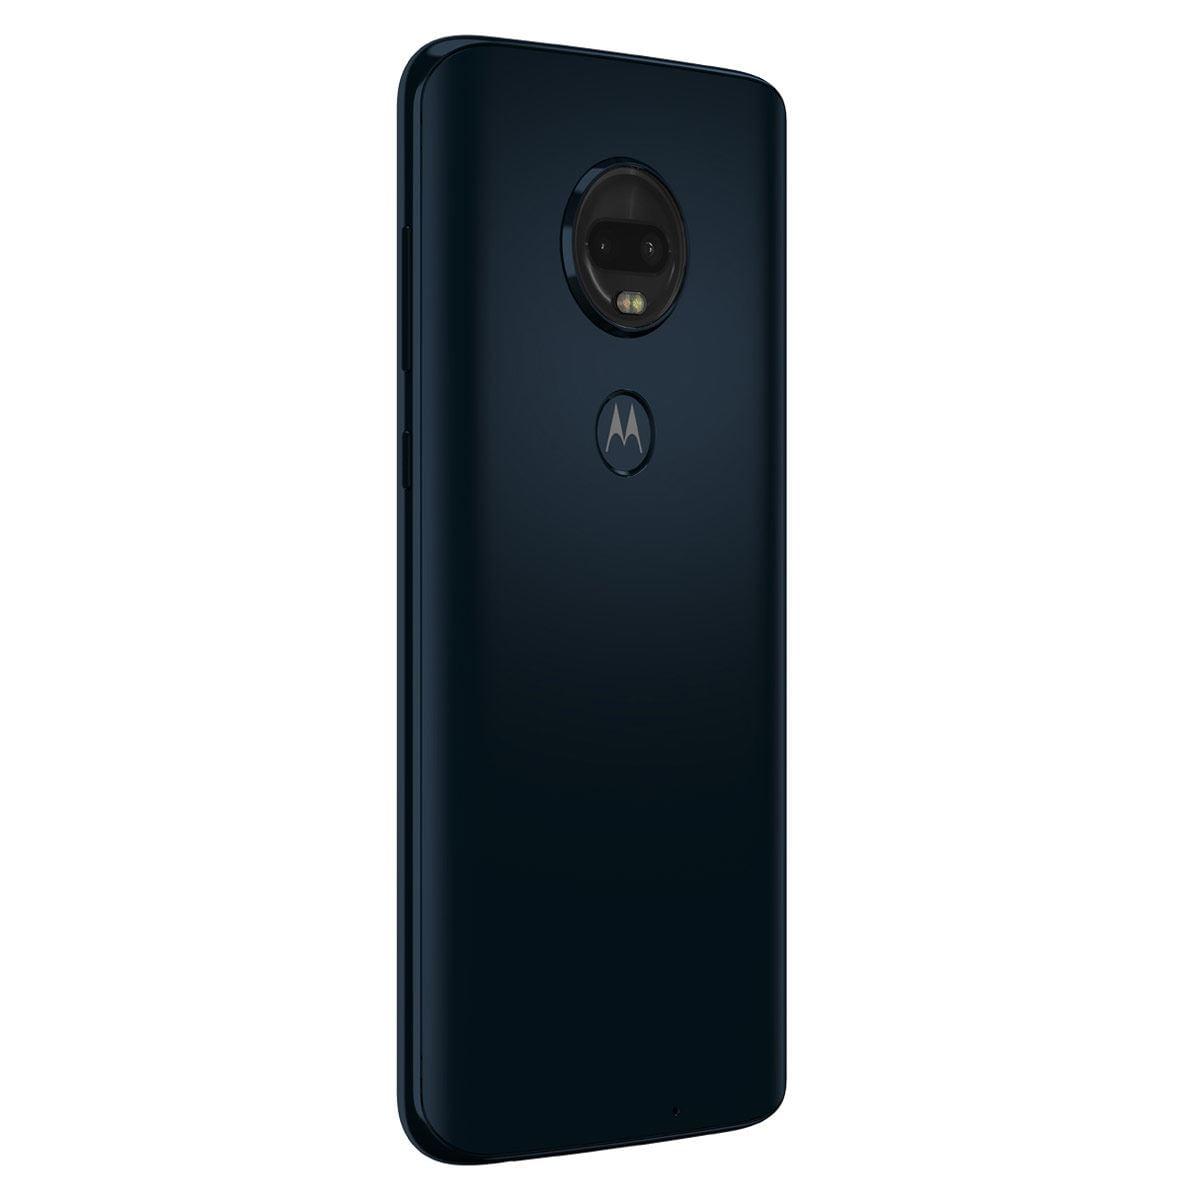 Celular Motorola XT1965-2 G7 Plus Color Indigo R9 (Telcel)